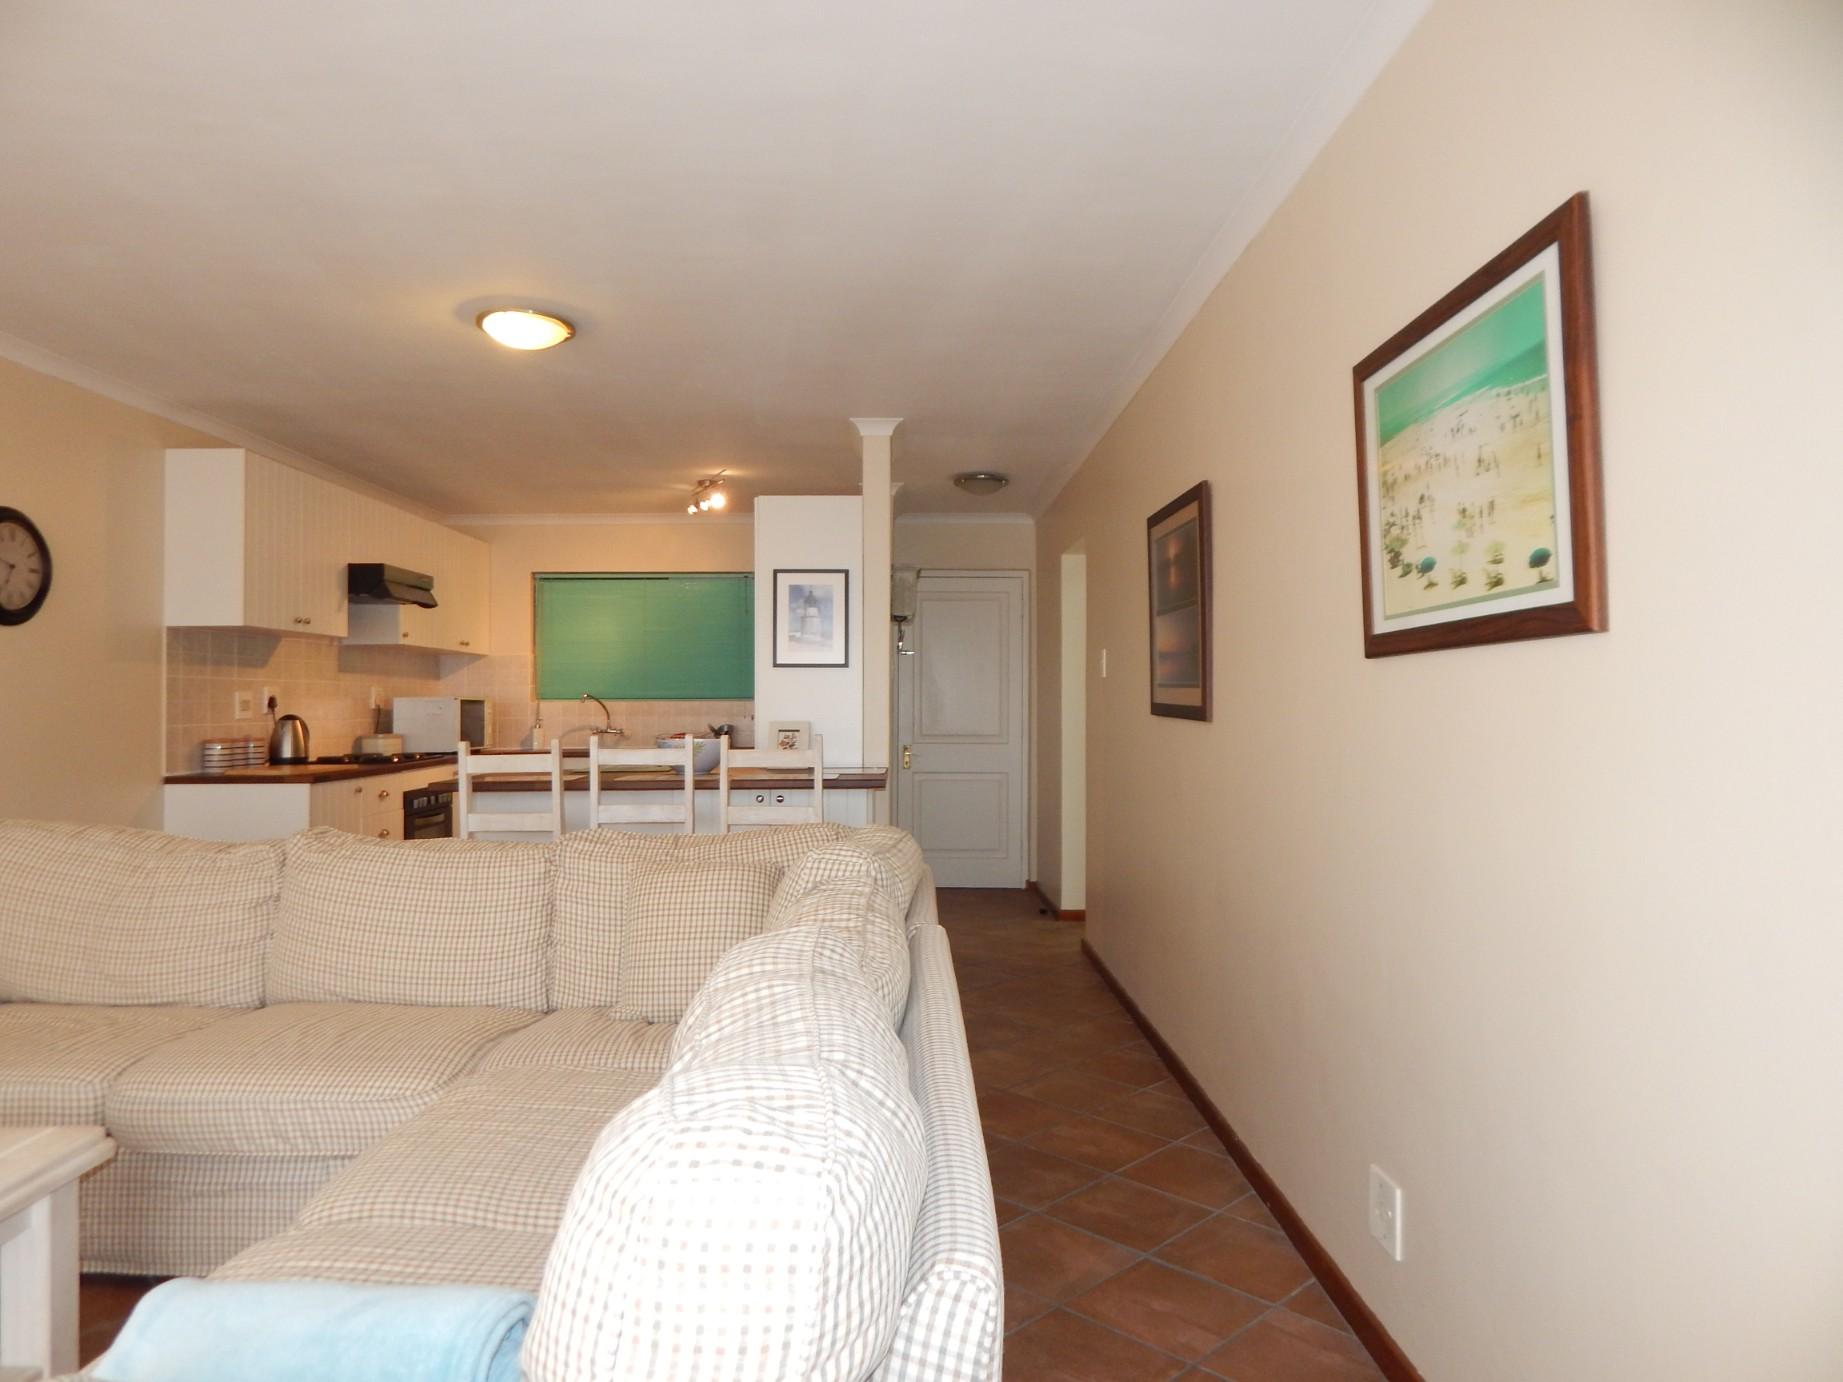 3 Bedroom Apartment for sale in De Bakke ENT0066483 : photo#3